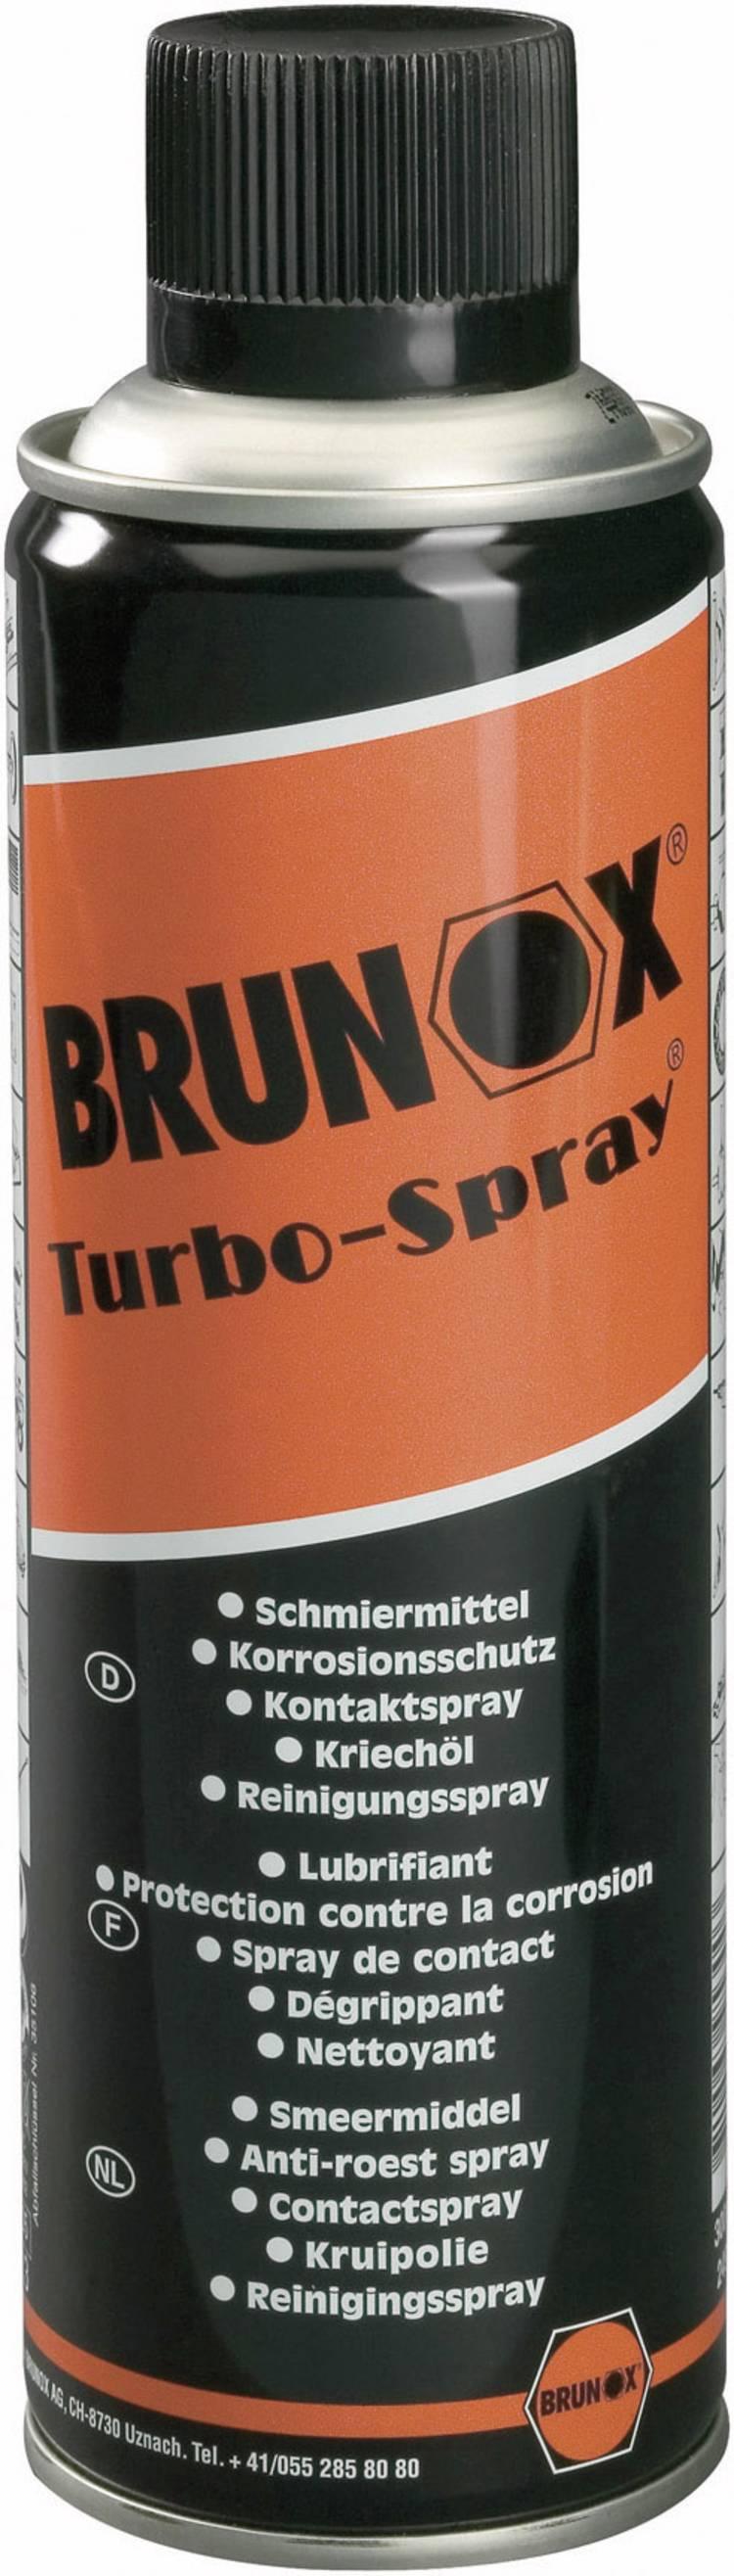 Image of Multifunctionele spray 300 ml Brunox TURBO-SPRAY BR0,30TS